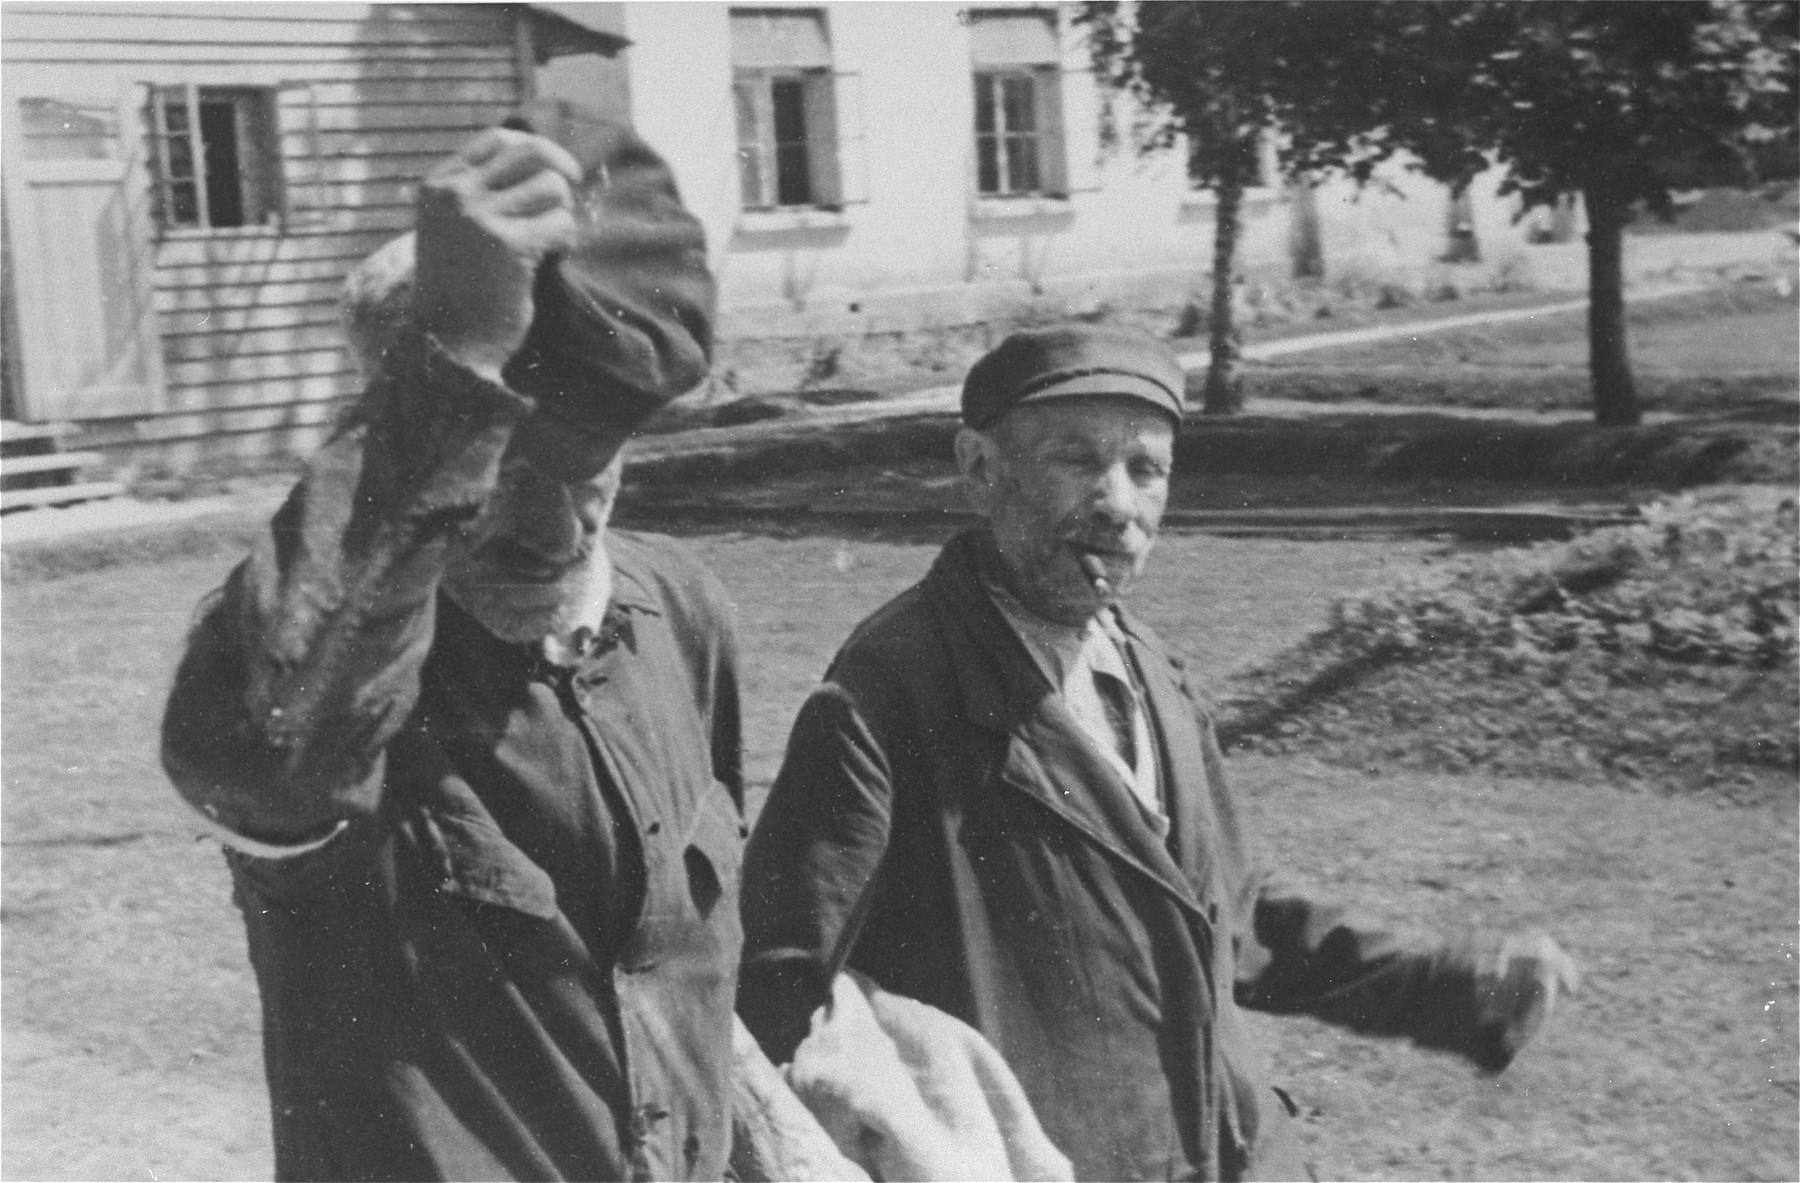 An elderly Jewish man doffs his hat as he walks outside with a companion in Konskowola.